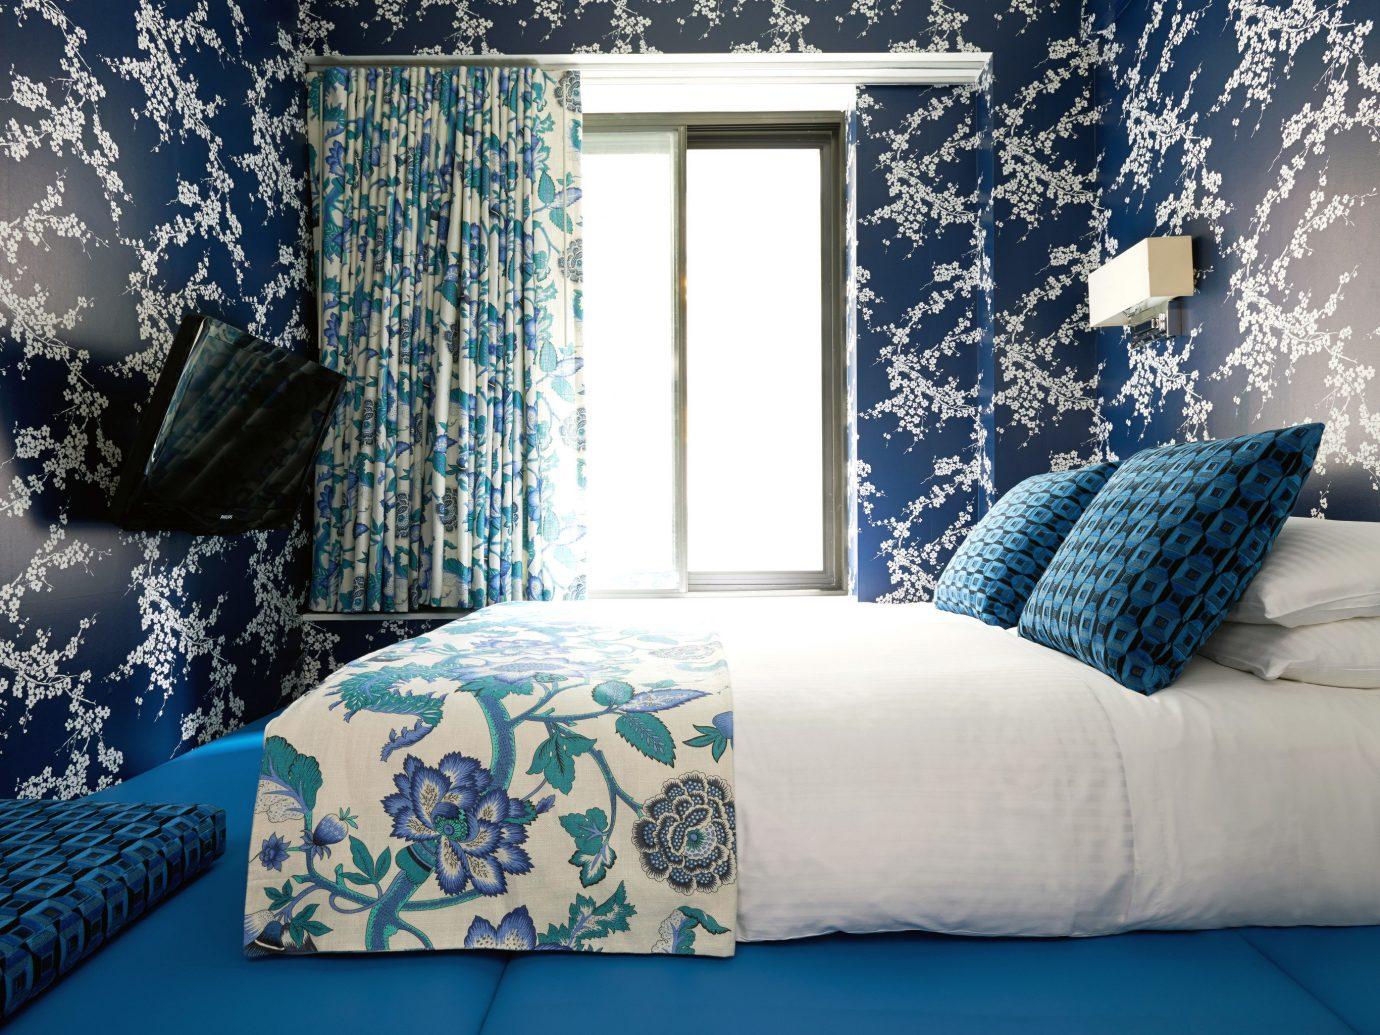 Budget sofa indoor blue room window pillow bed sheet furniture interior design living room textile wallpaper Bedroom Design bedclothes decorated colored